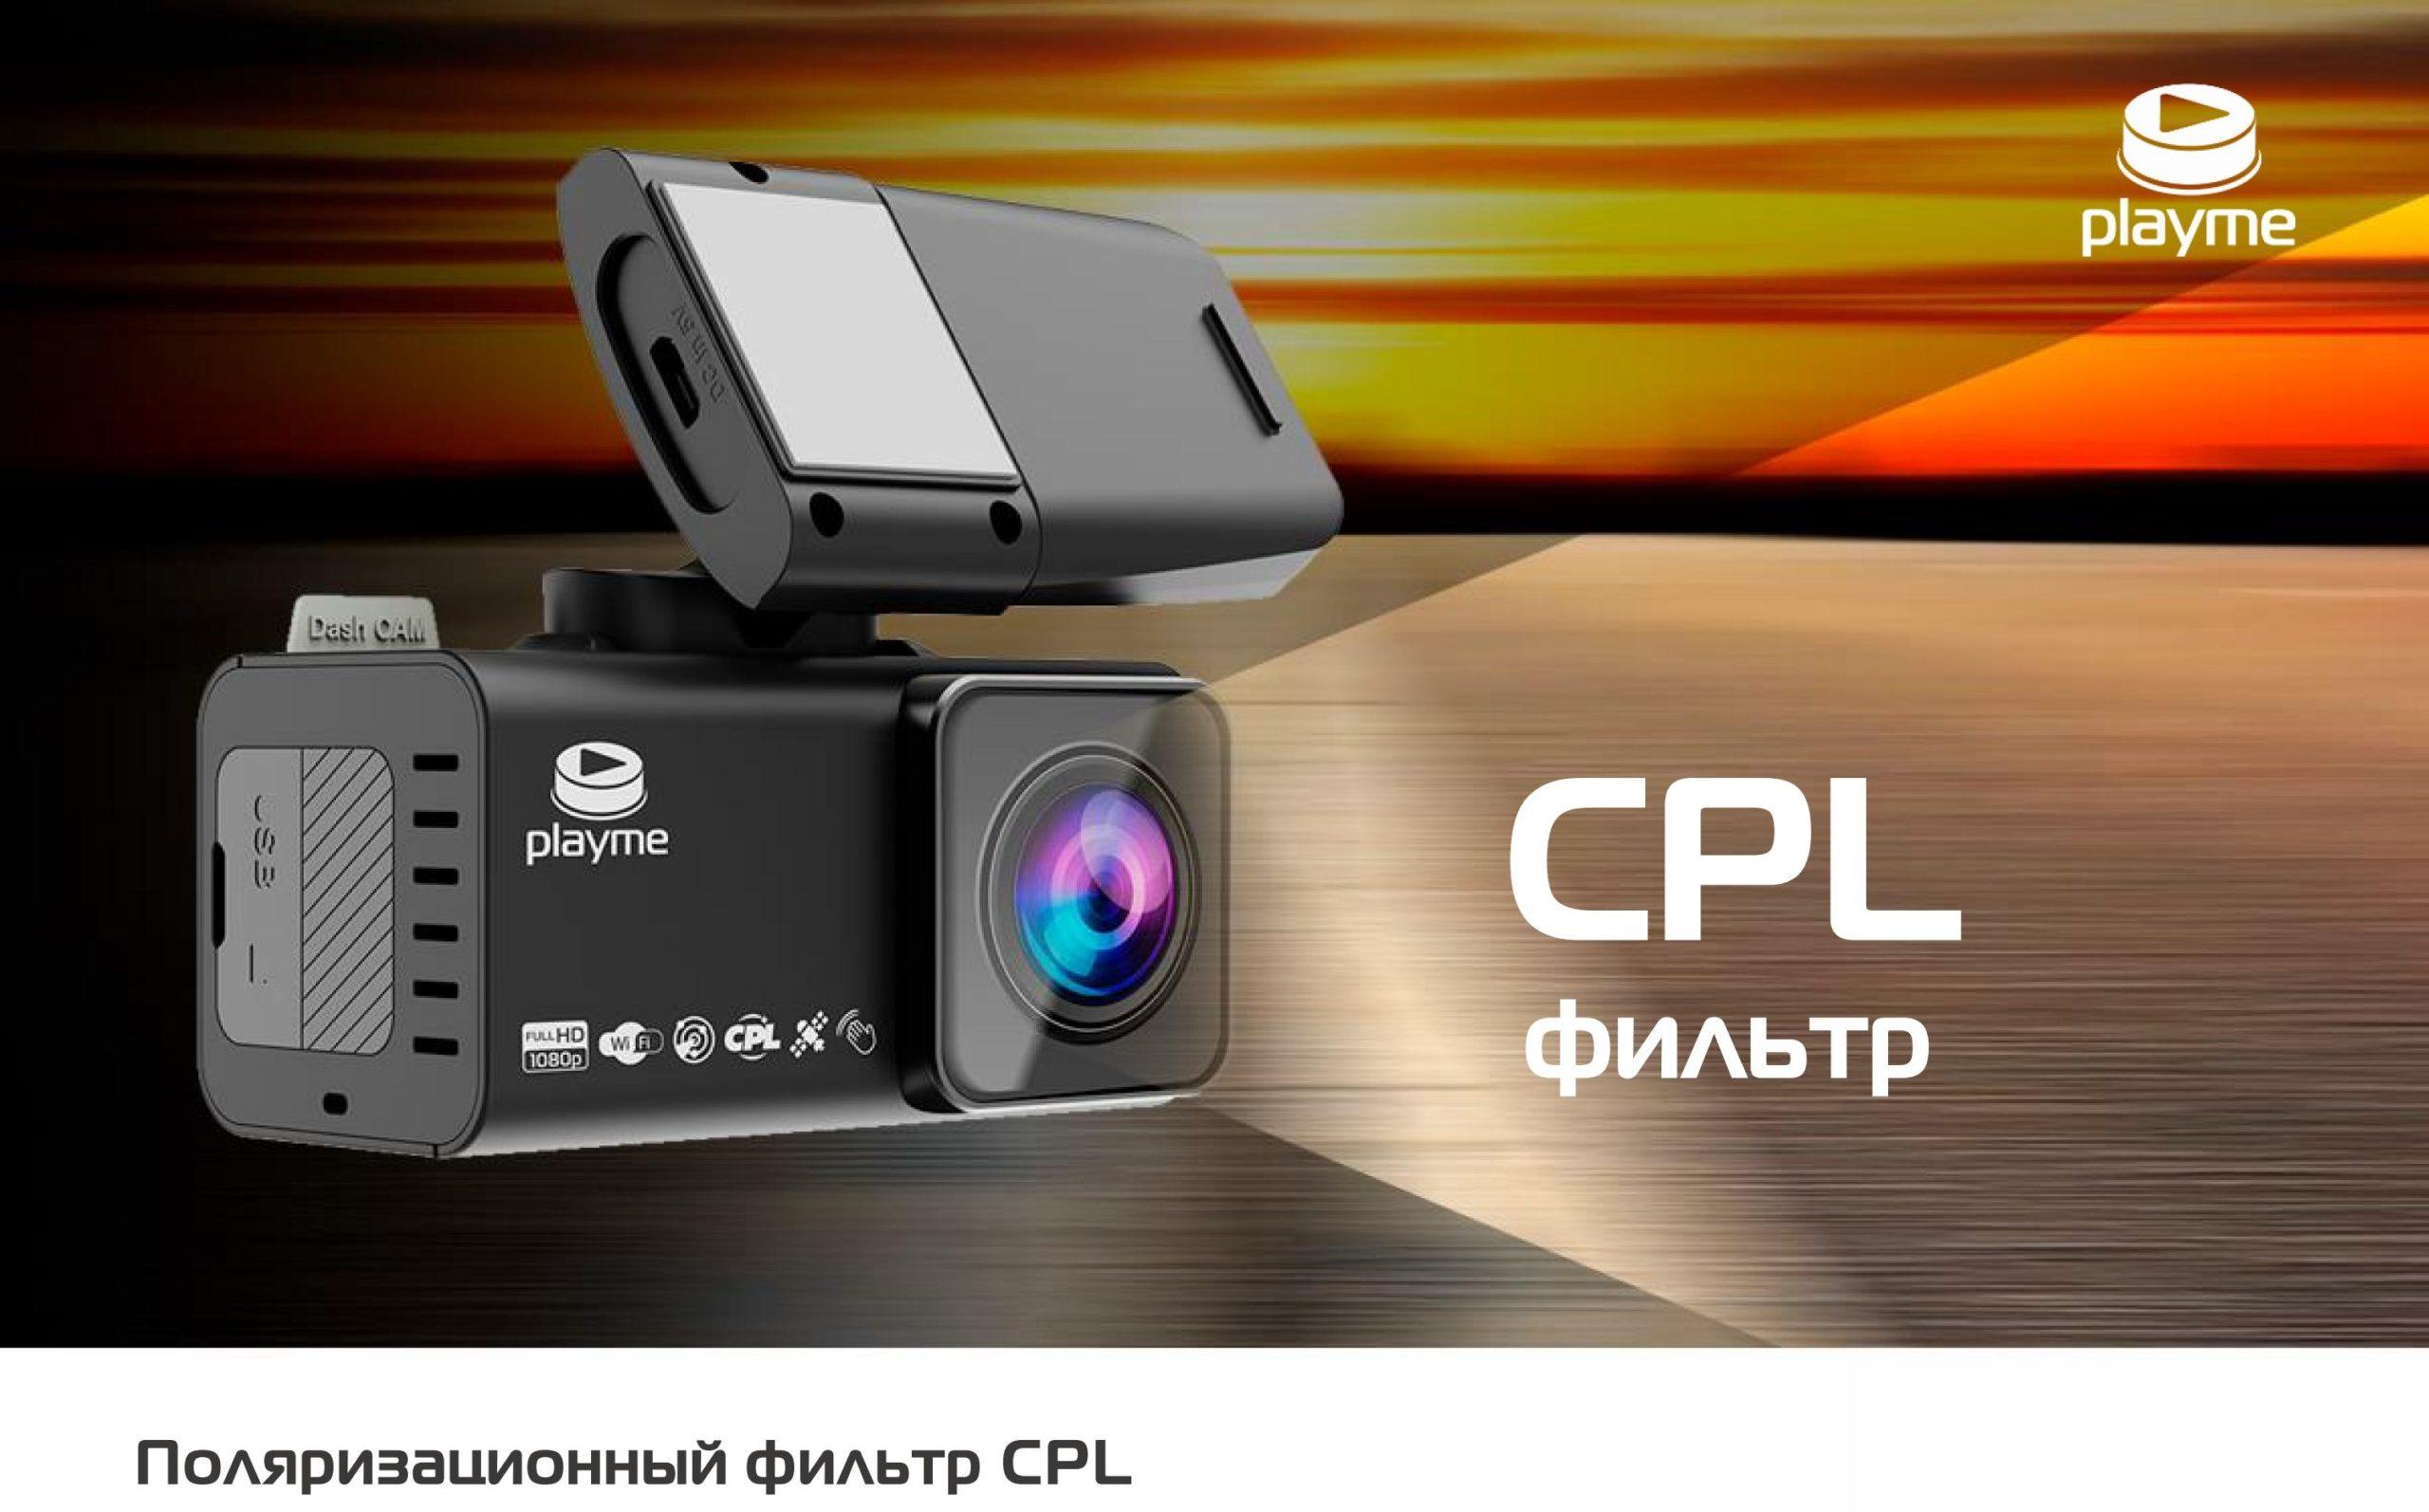 d4d890e7 3e60 434b 8dce 6654056b0a63 scaled VideoregObzor Новый видеорегистратор Playme TIO S доступен к заказу